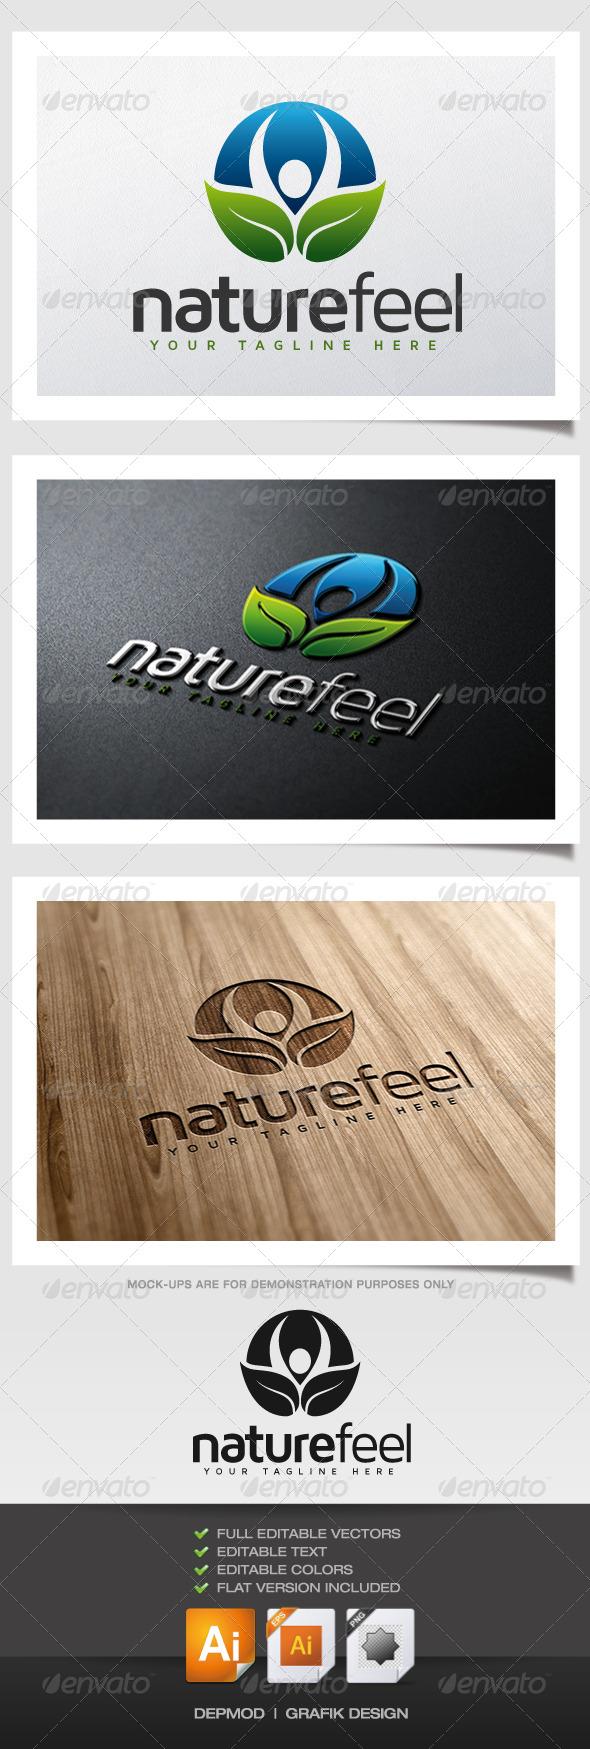 GraphicRiver Nature Feel Logo 5898287